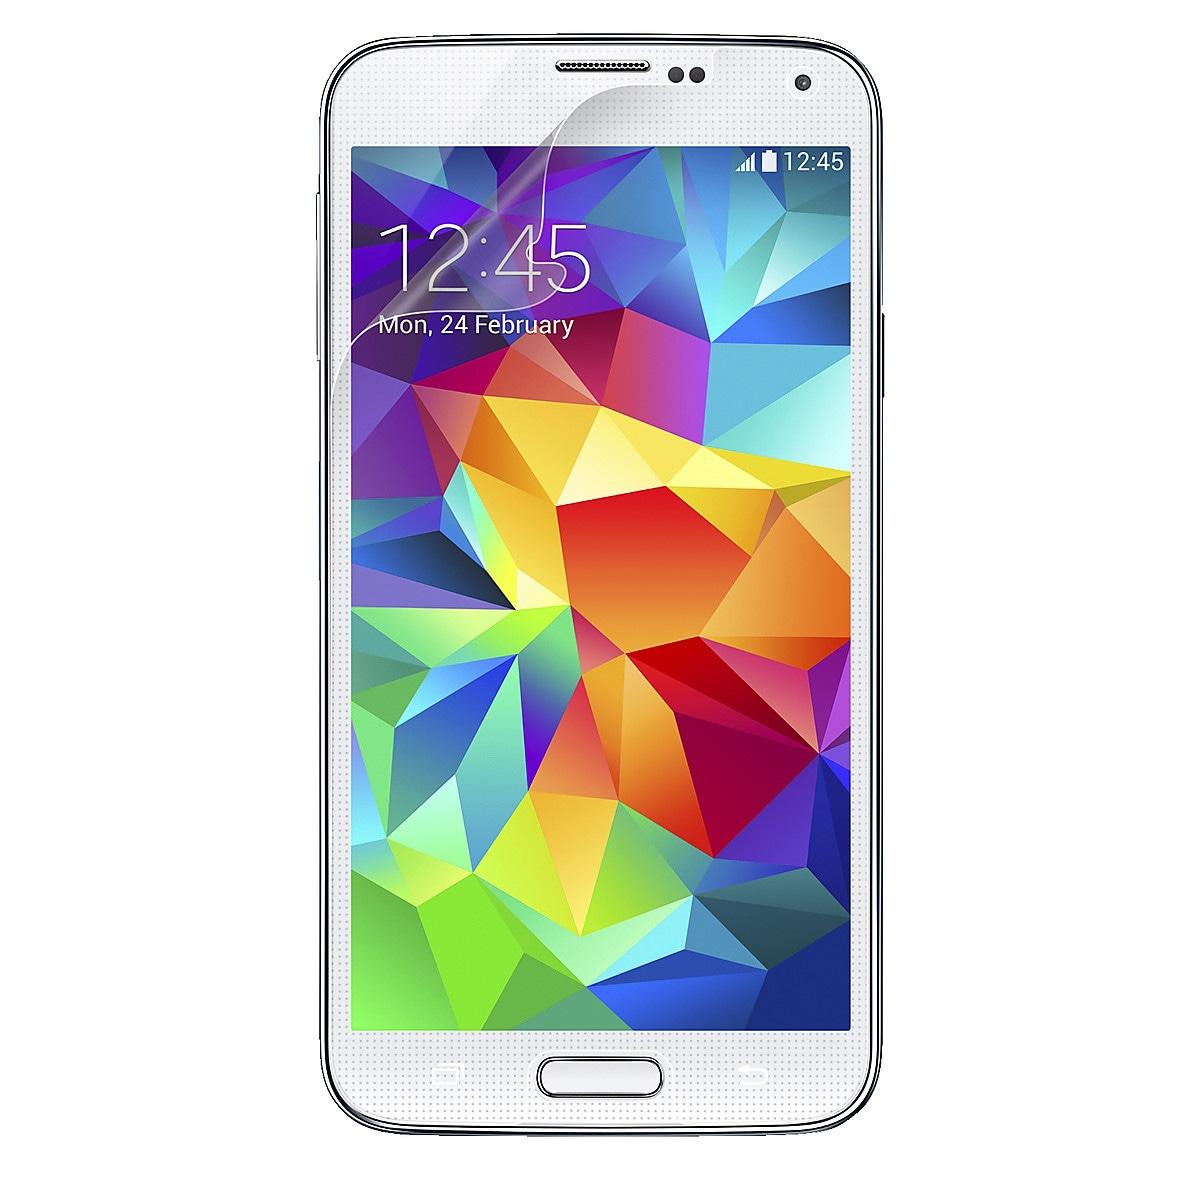 Näytönsuojus Samsung Galaxy S5:lle, Belkin